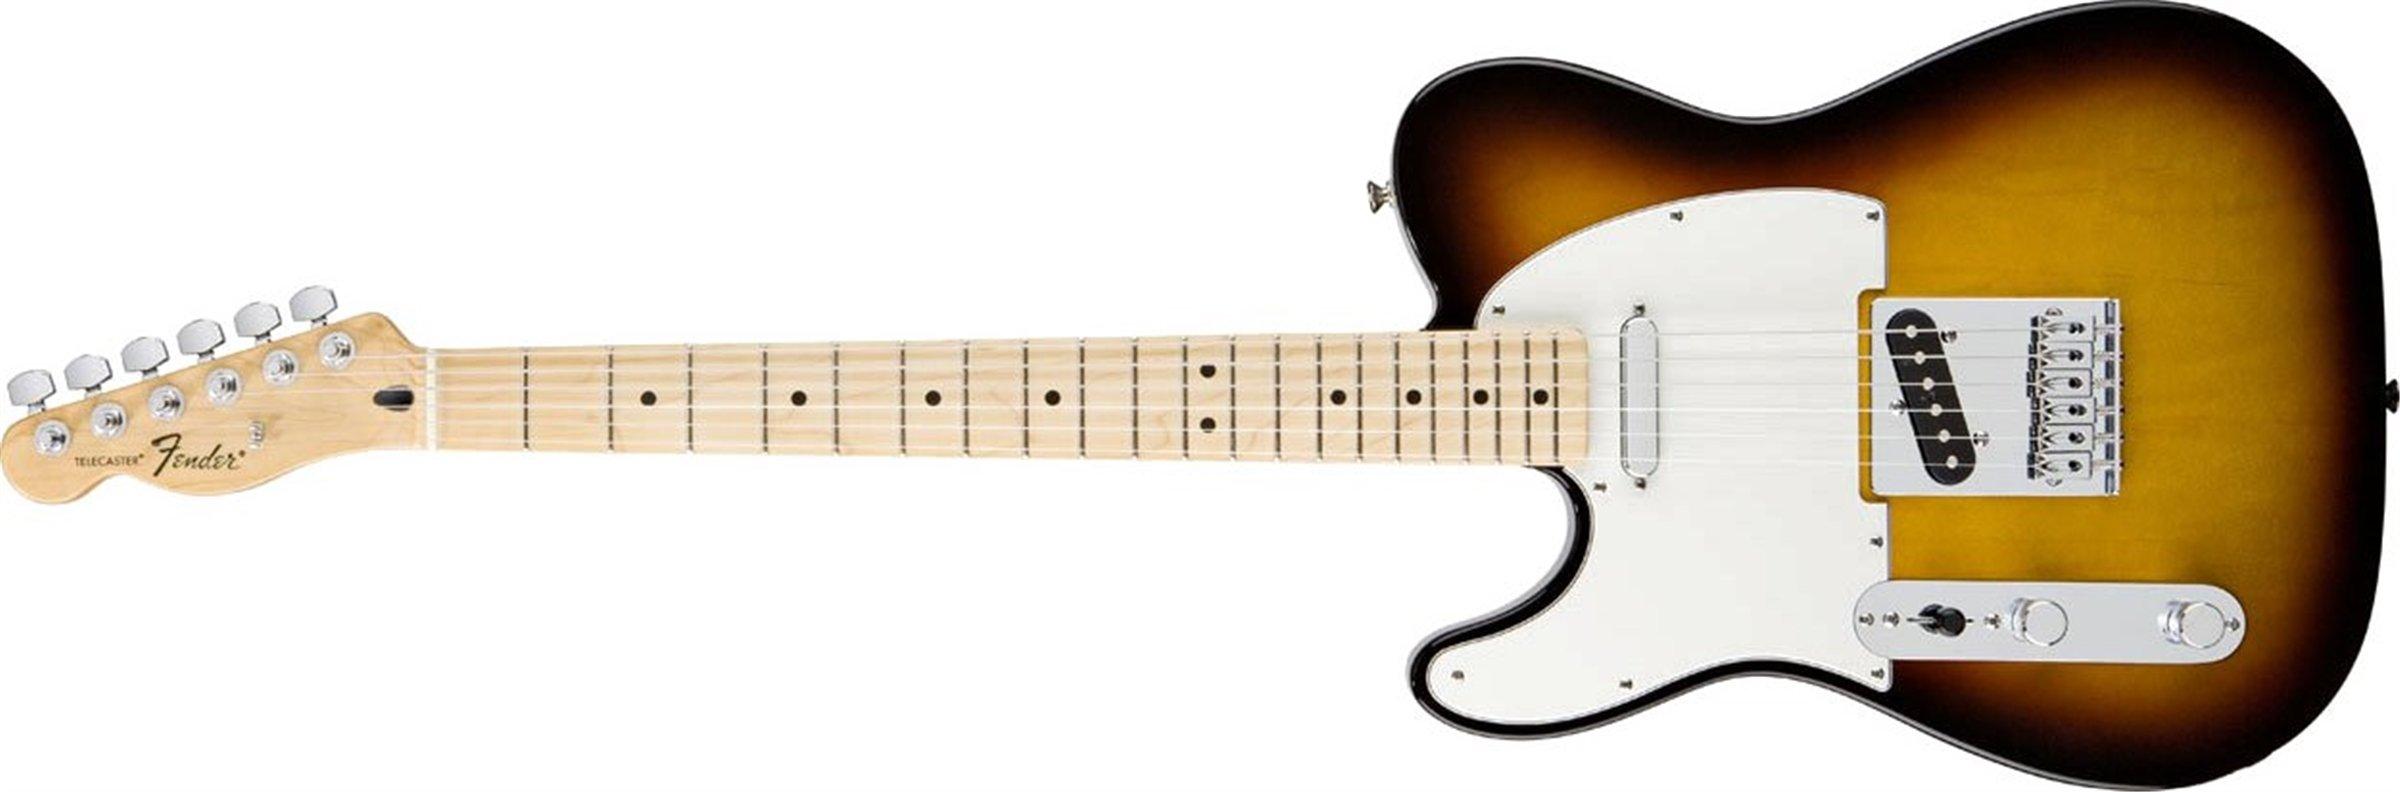 Cheap Fender Standard Telecaster Electric Guitar - Left Handed - Maple Fingerboard Brown Sunburst Black Friday & Cyber Monday 2019